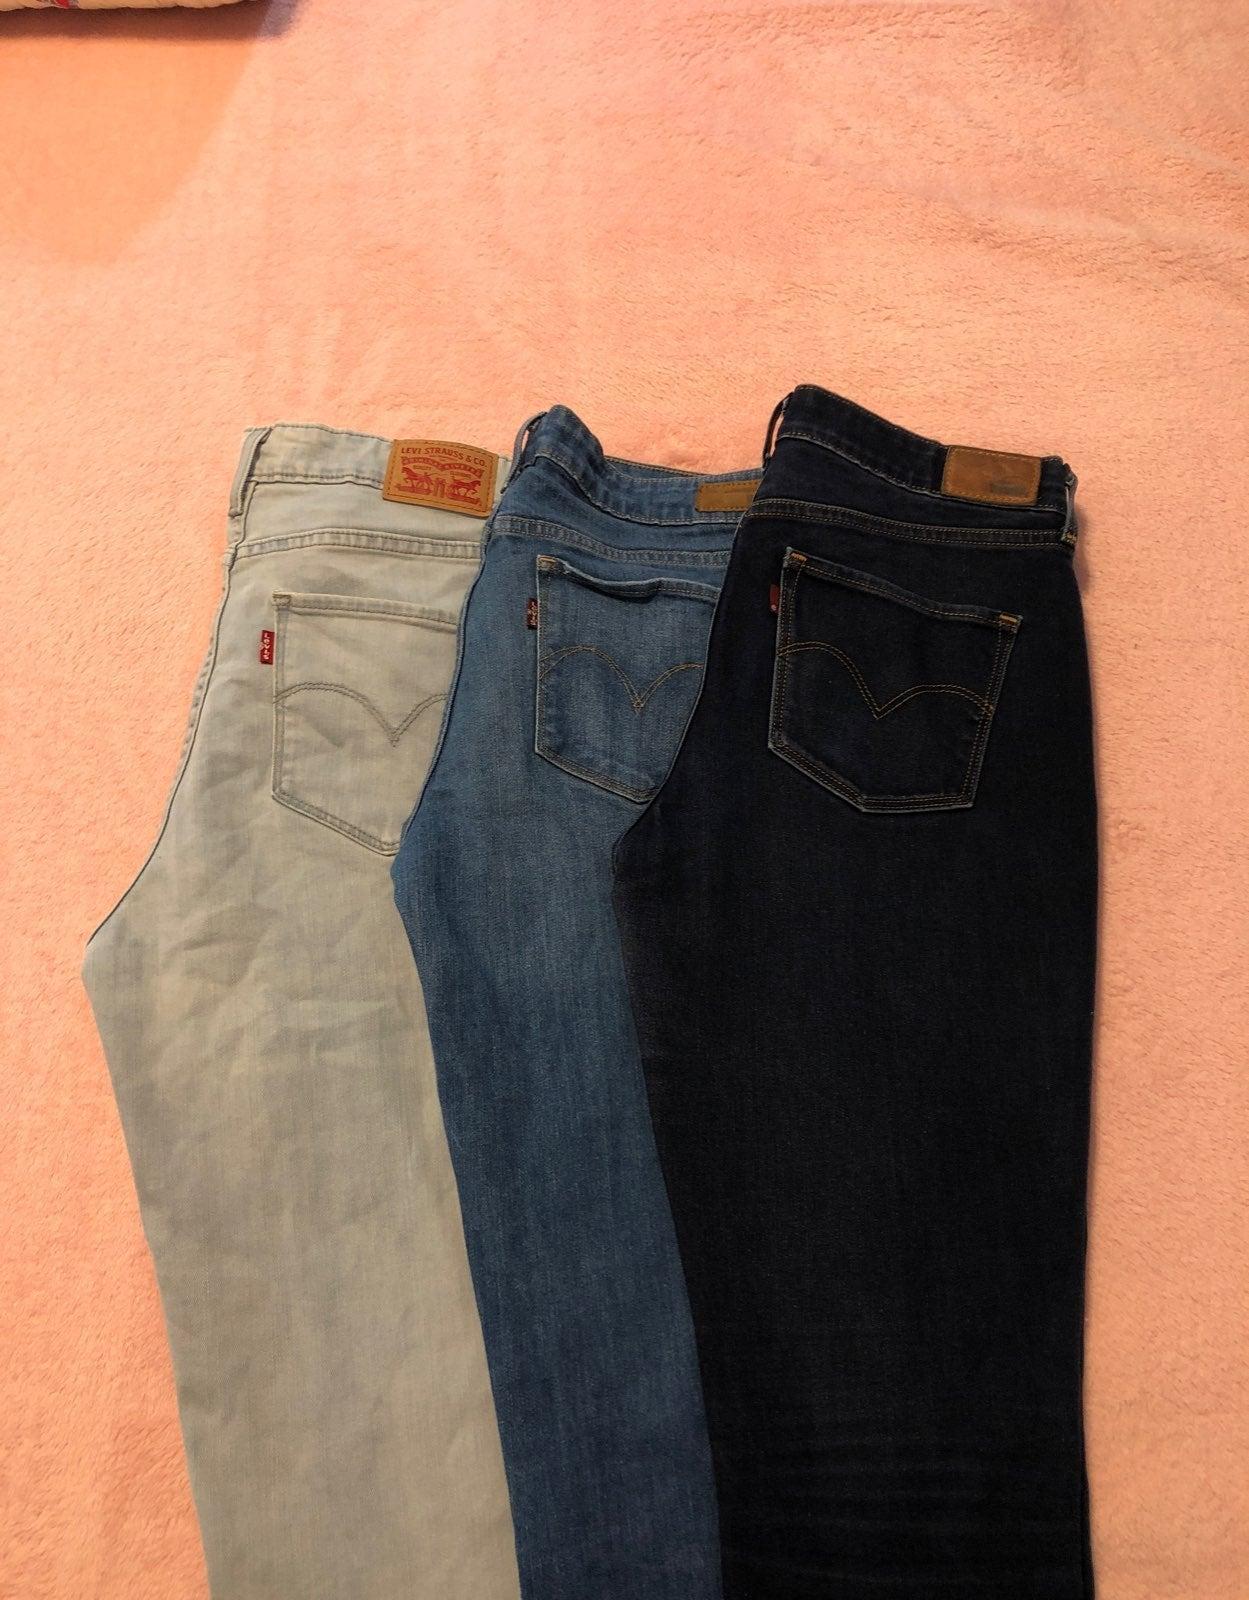 Levi's Skinny Jeans (3) Pair Size 30